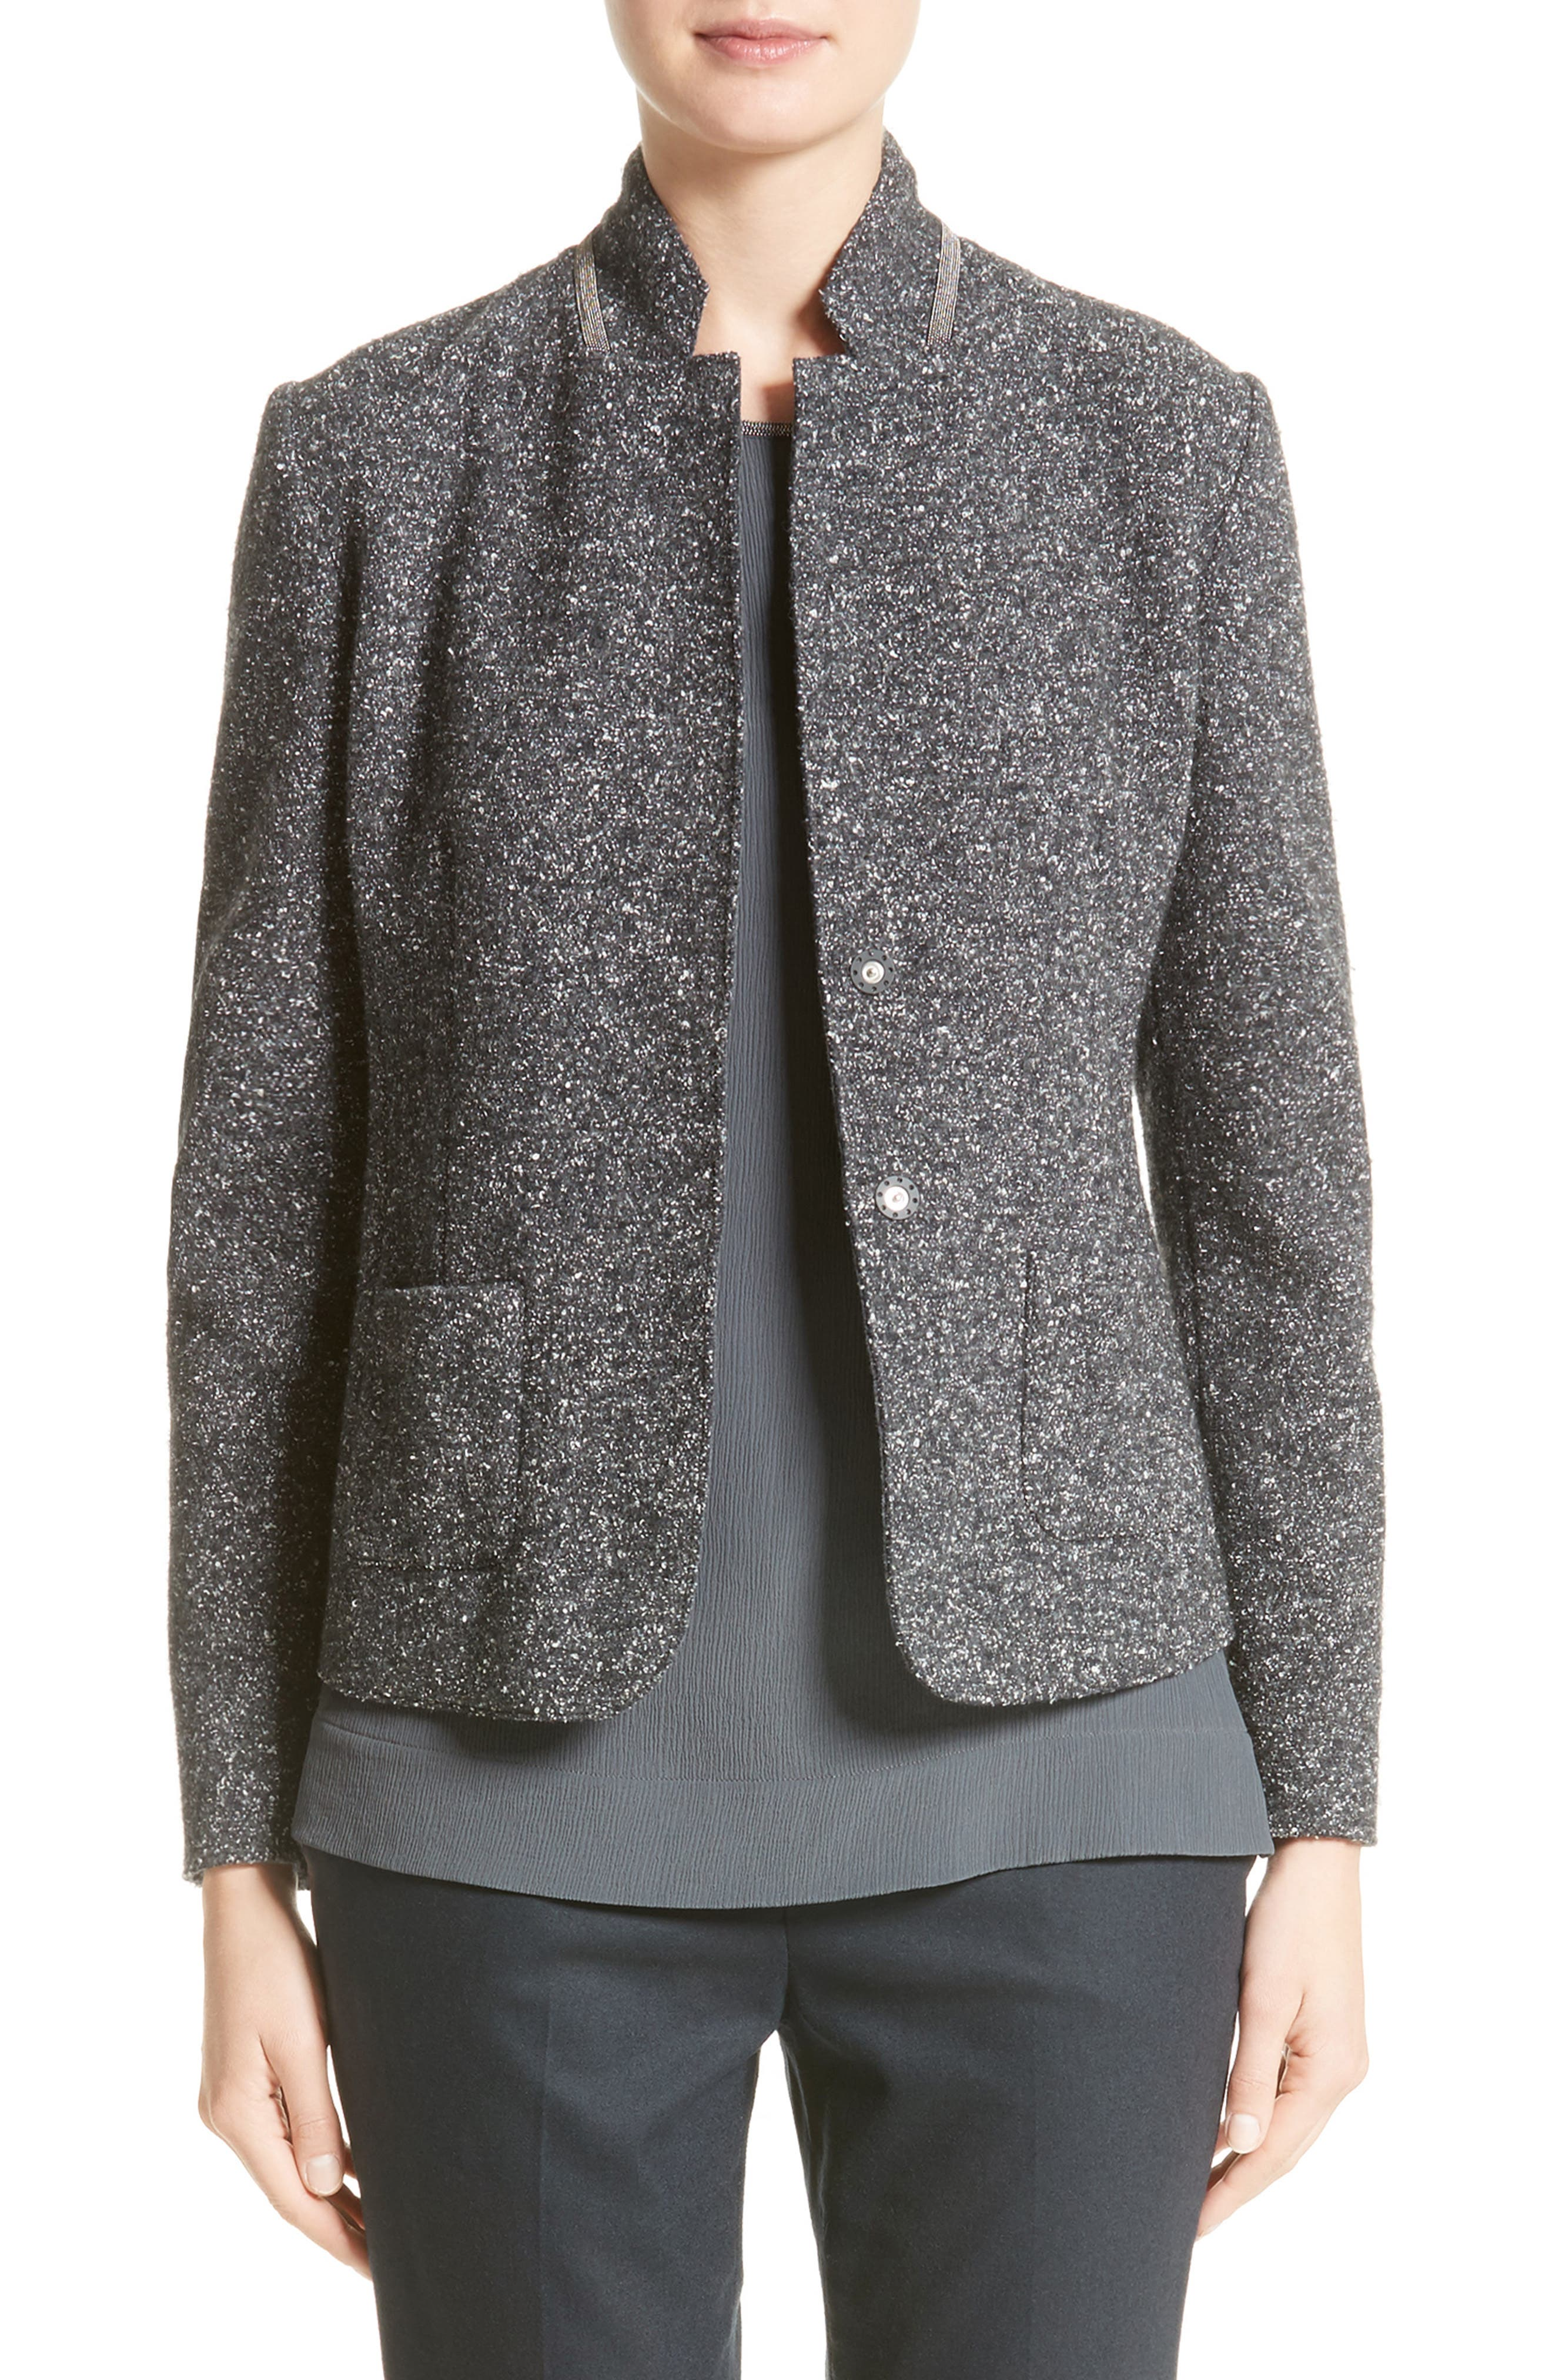 Pebble Tweed Knit Jacket,                         Main,                         color, Grey Multi